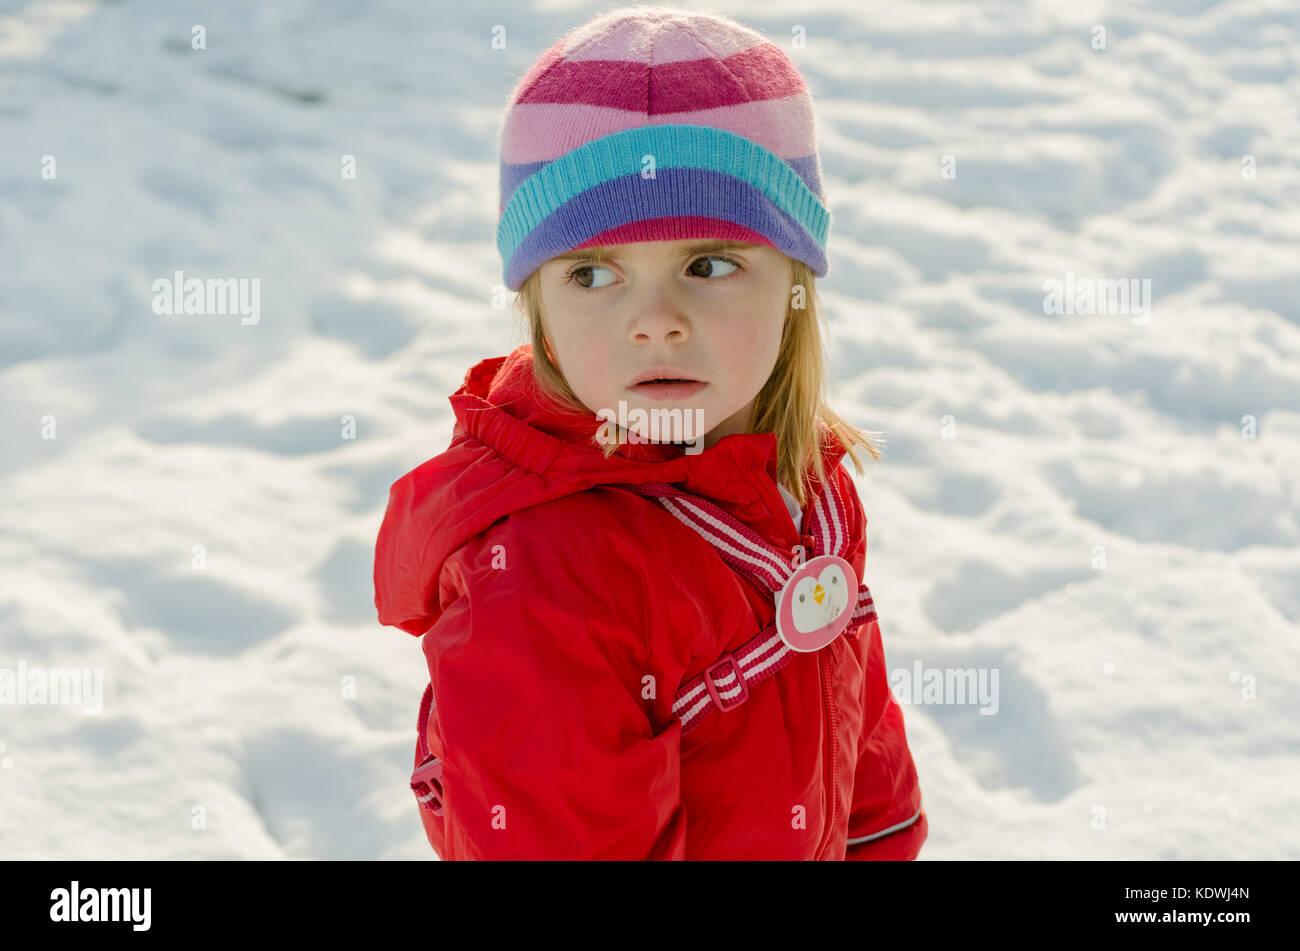 867f07acd Snowsuit Snow Stock Photos   Snowsuit Snow Stock Images - Alamy